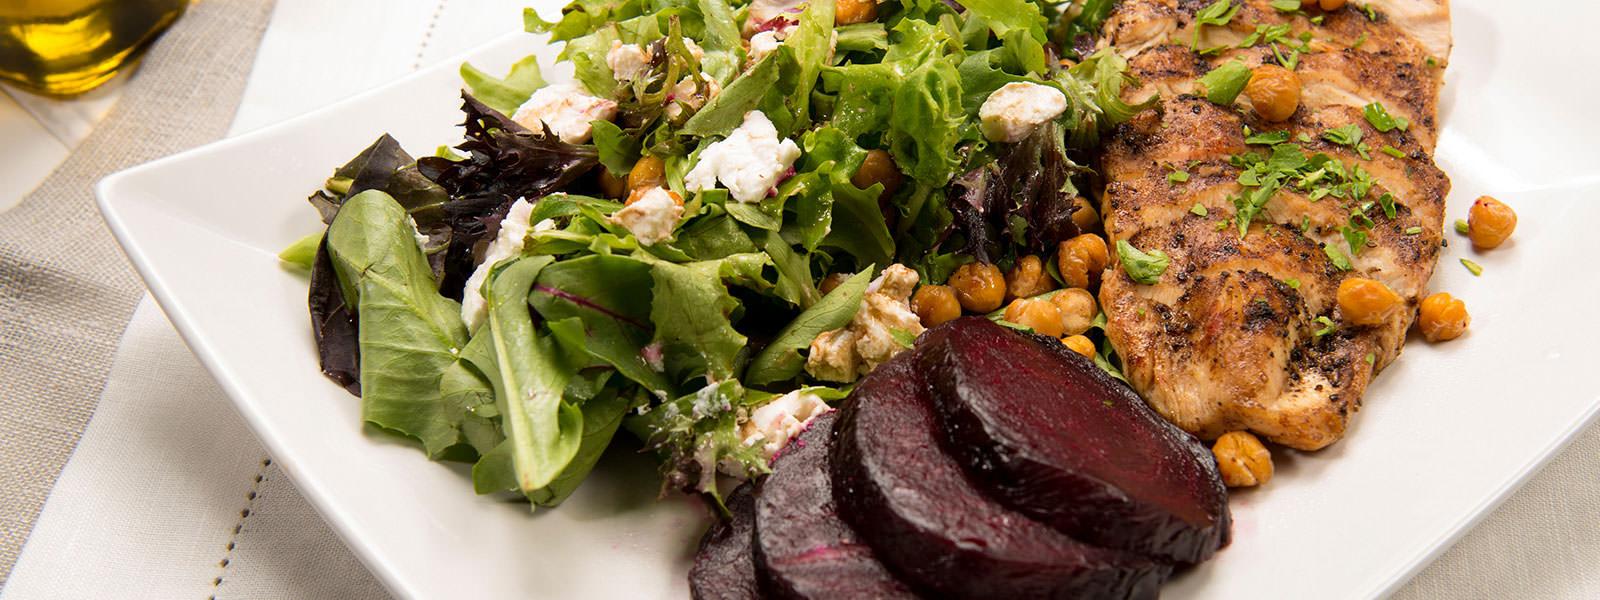 Malibu salad with smoked chicken: a recipe with photos 31